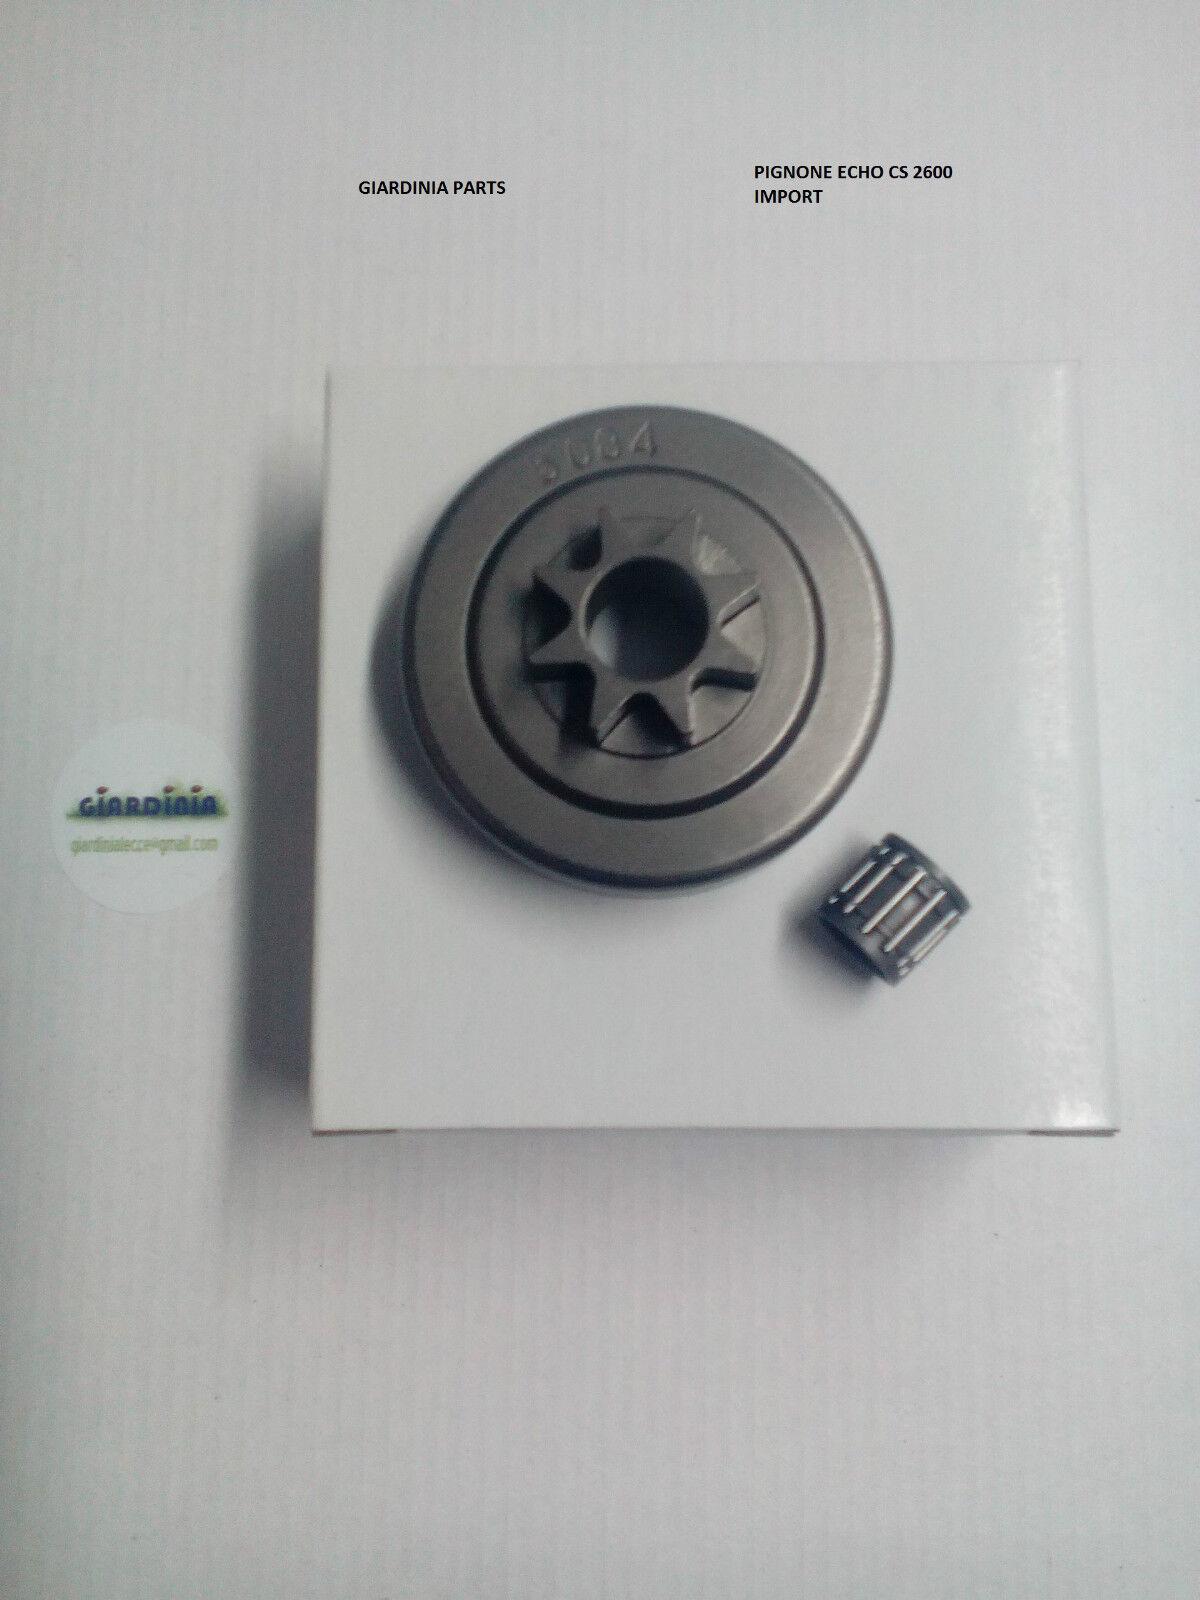 Piñón Eco X MTS Eco Cs 2600 1 4  Z8 X Compatible 3Pz Oferta